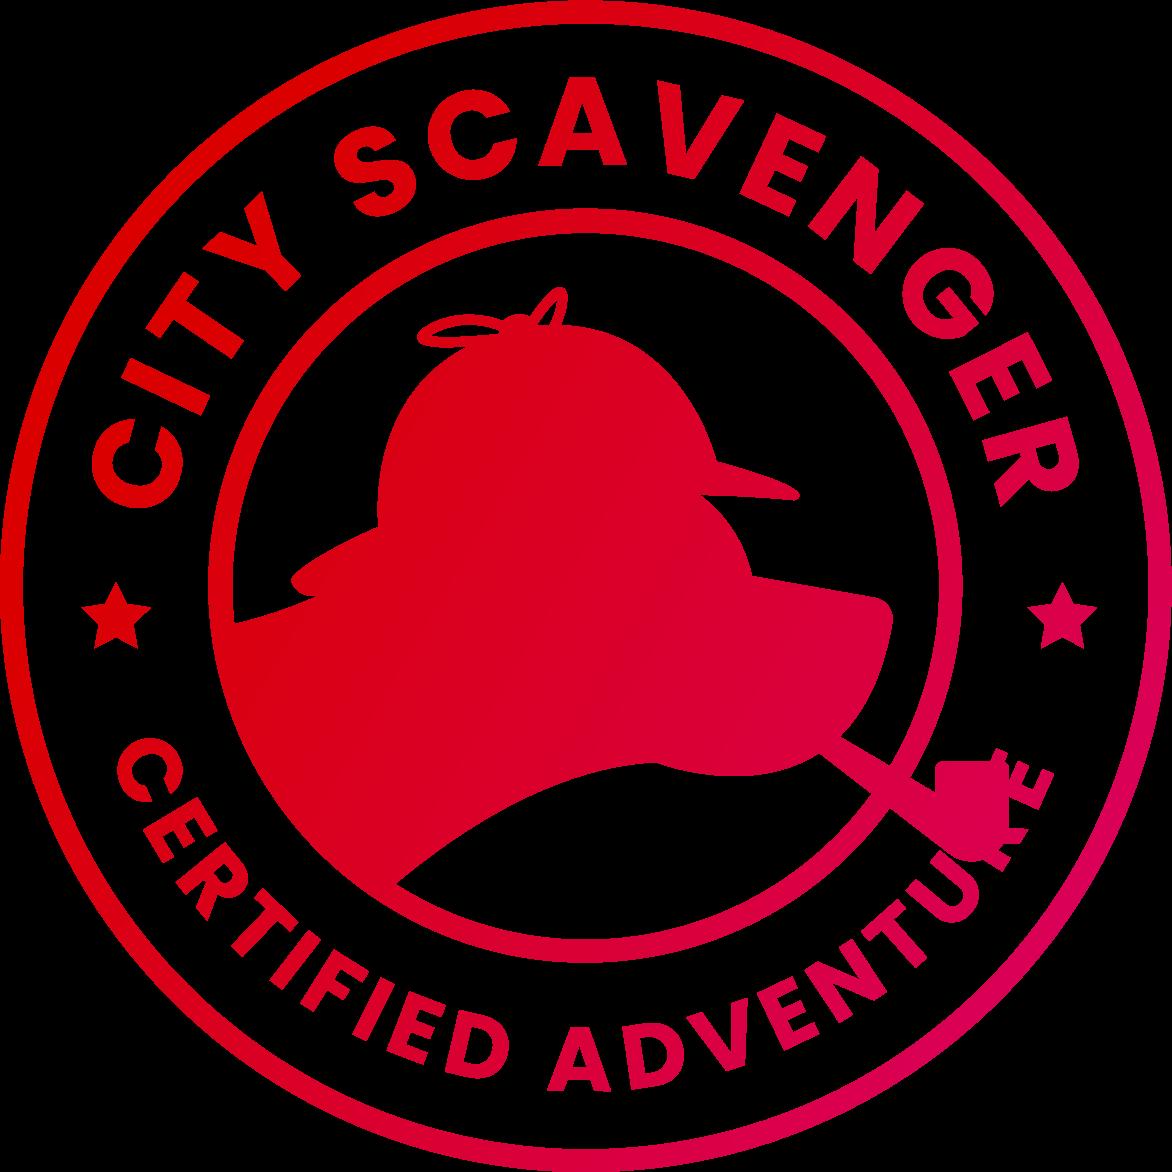 City Scavenger